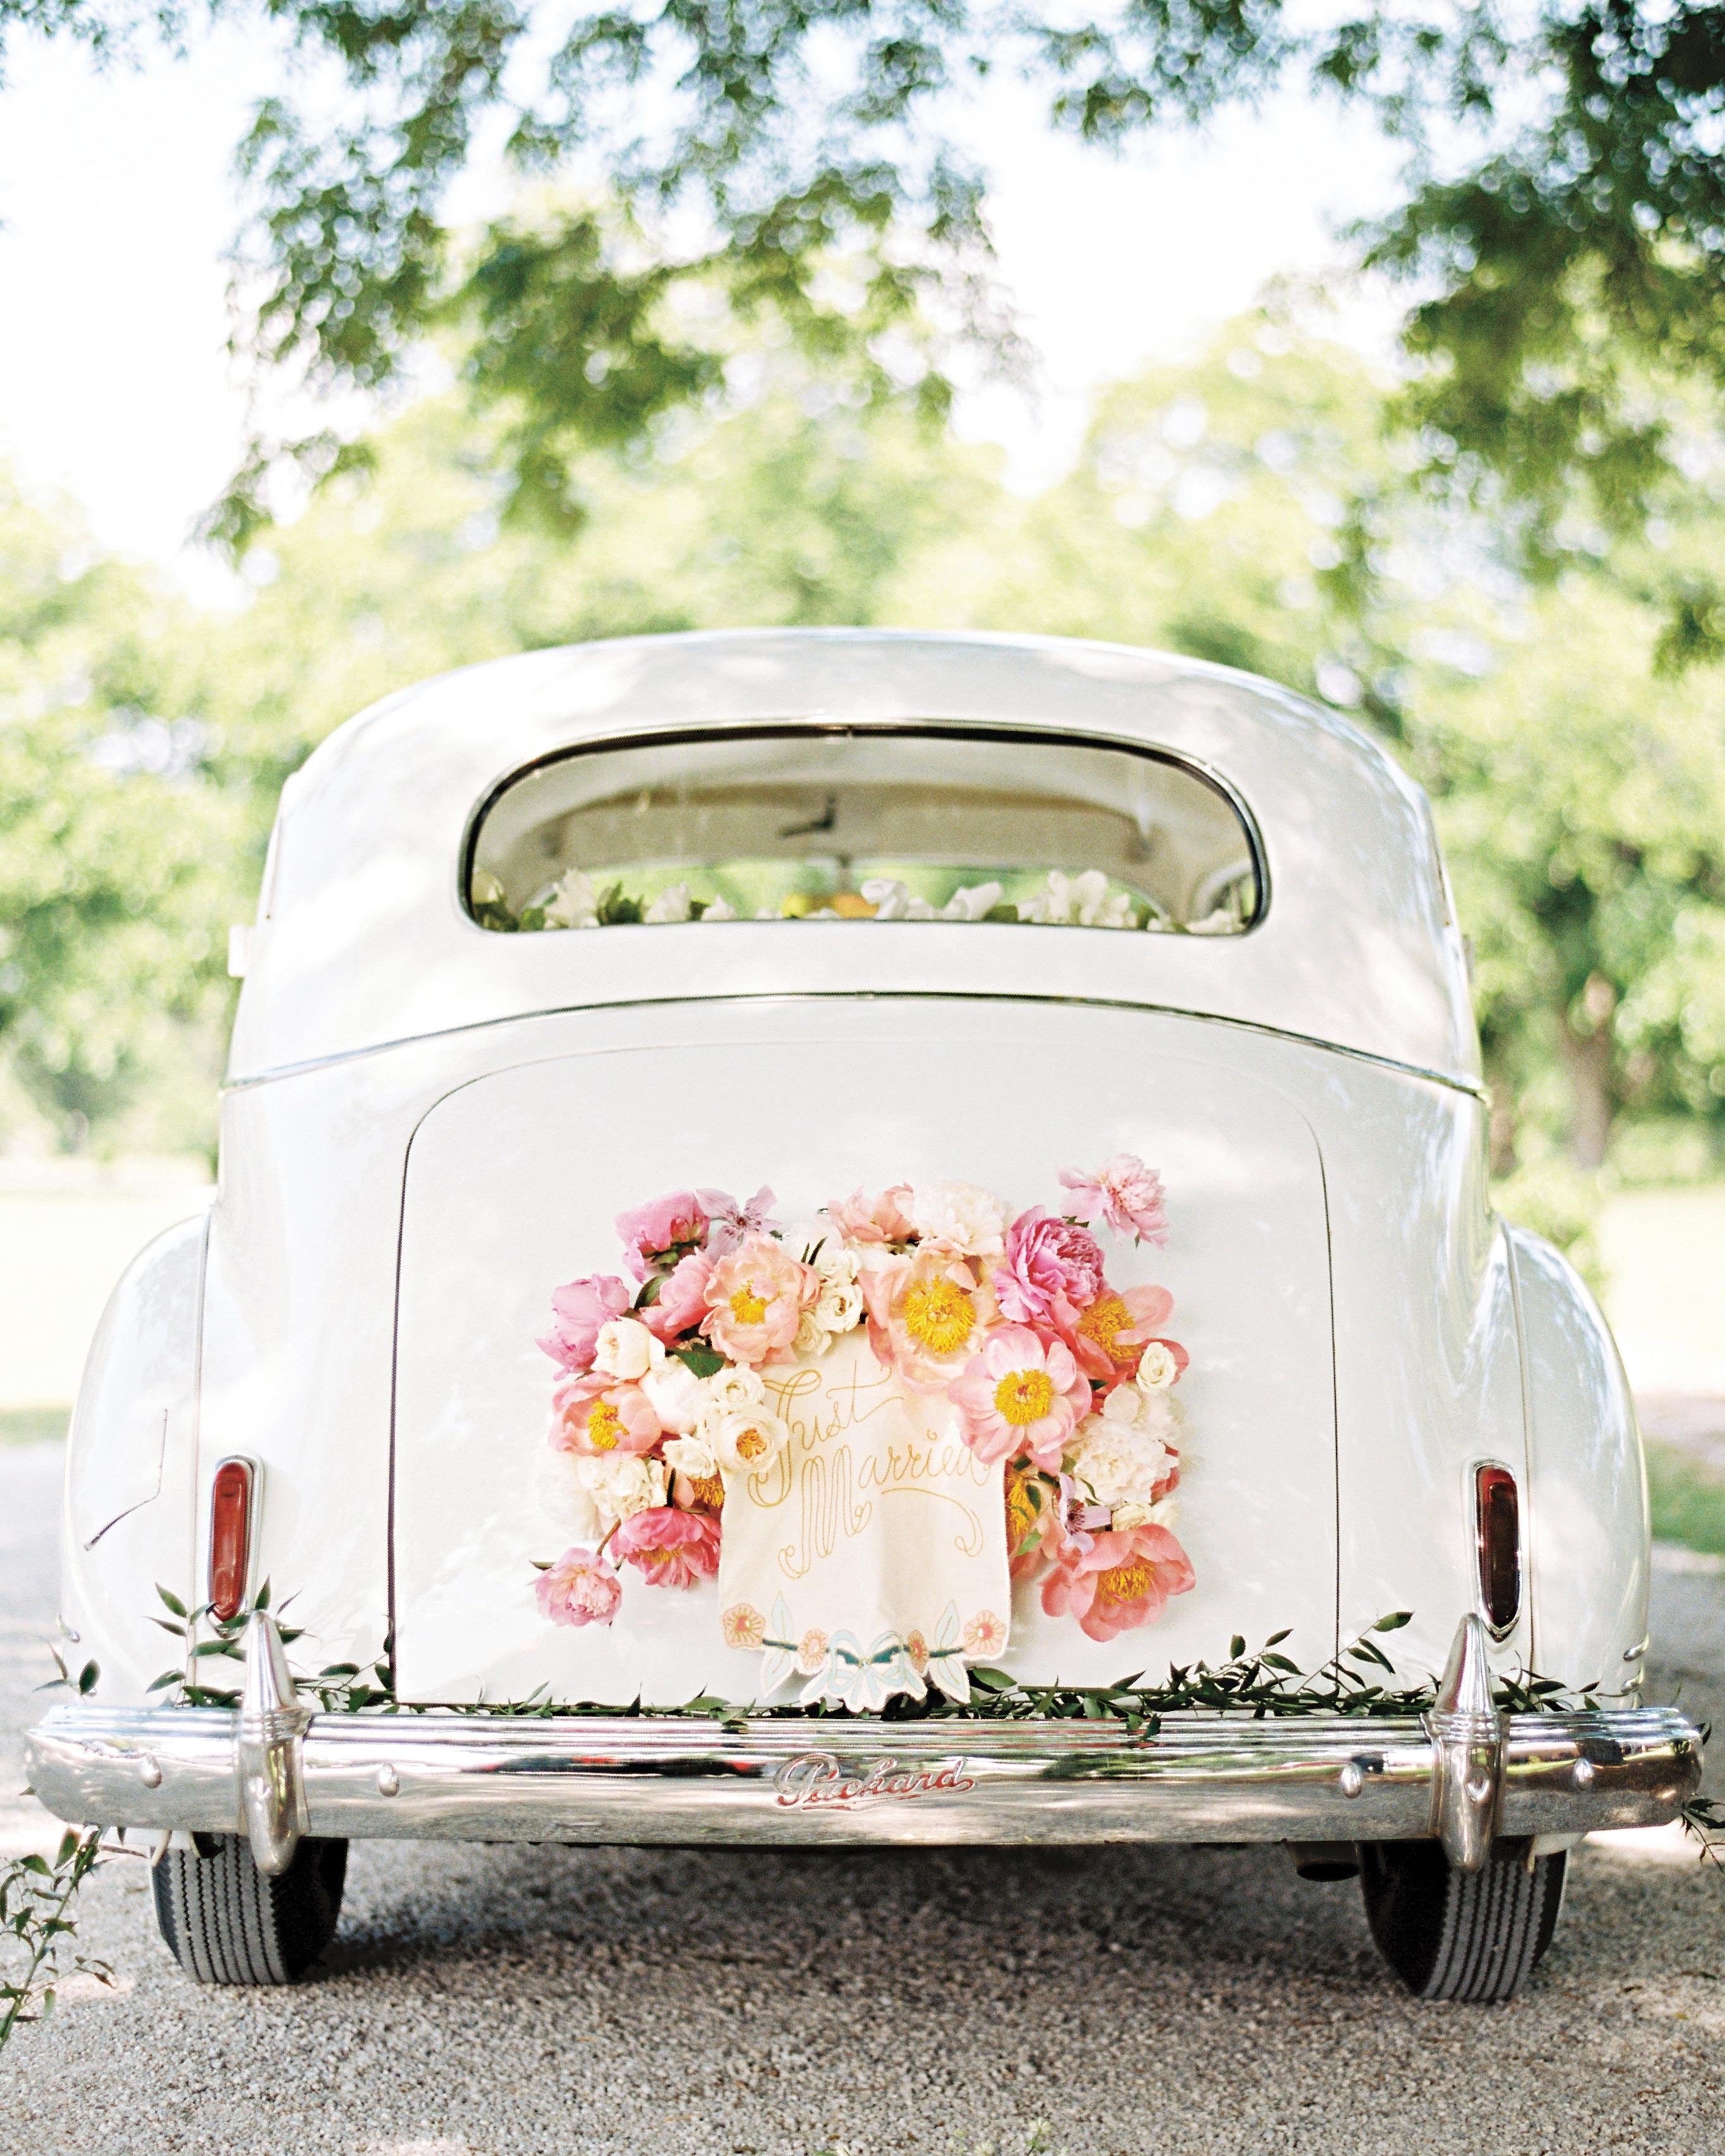 david-tyler-real-wedding-getaway-car.jpg